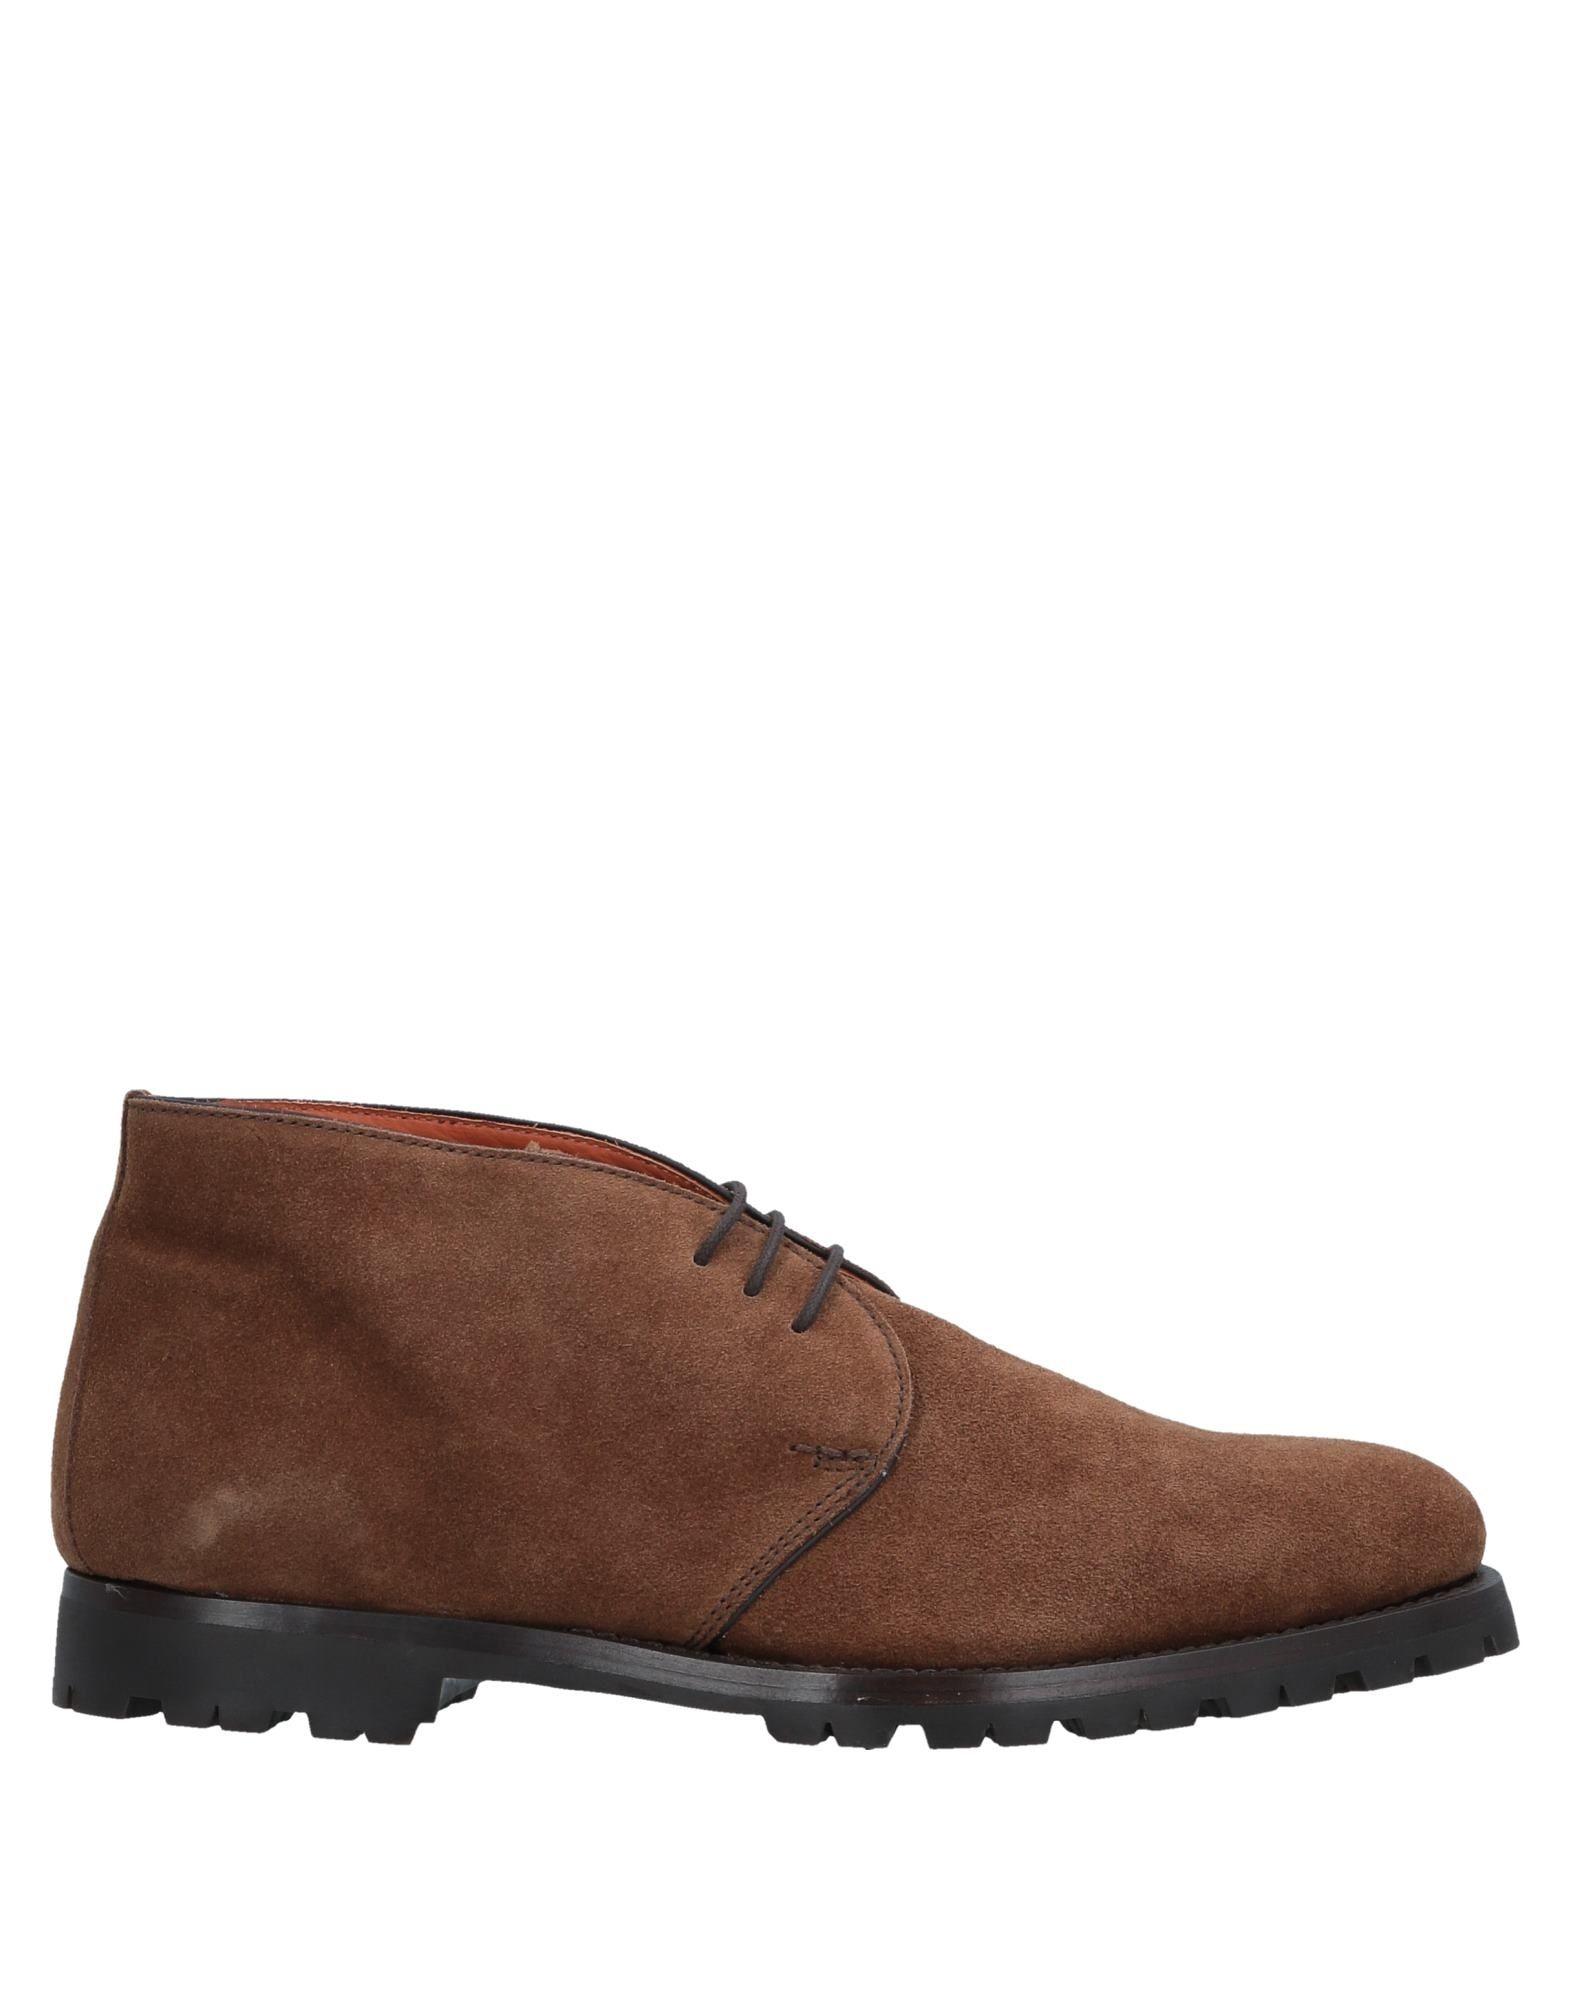 Andrea Ventura Firenze Stiefelette Herren  11529851DQ Gute Qualität beliebte Schuhe